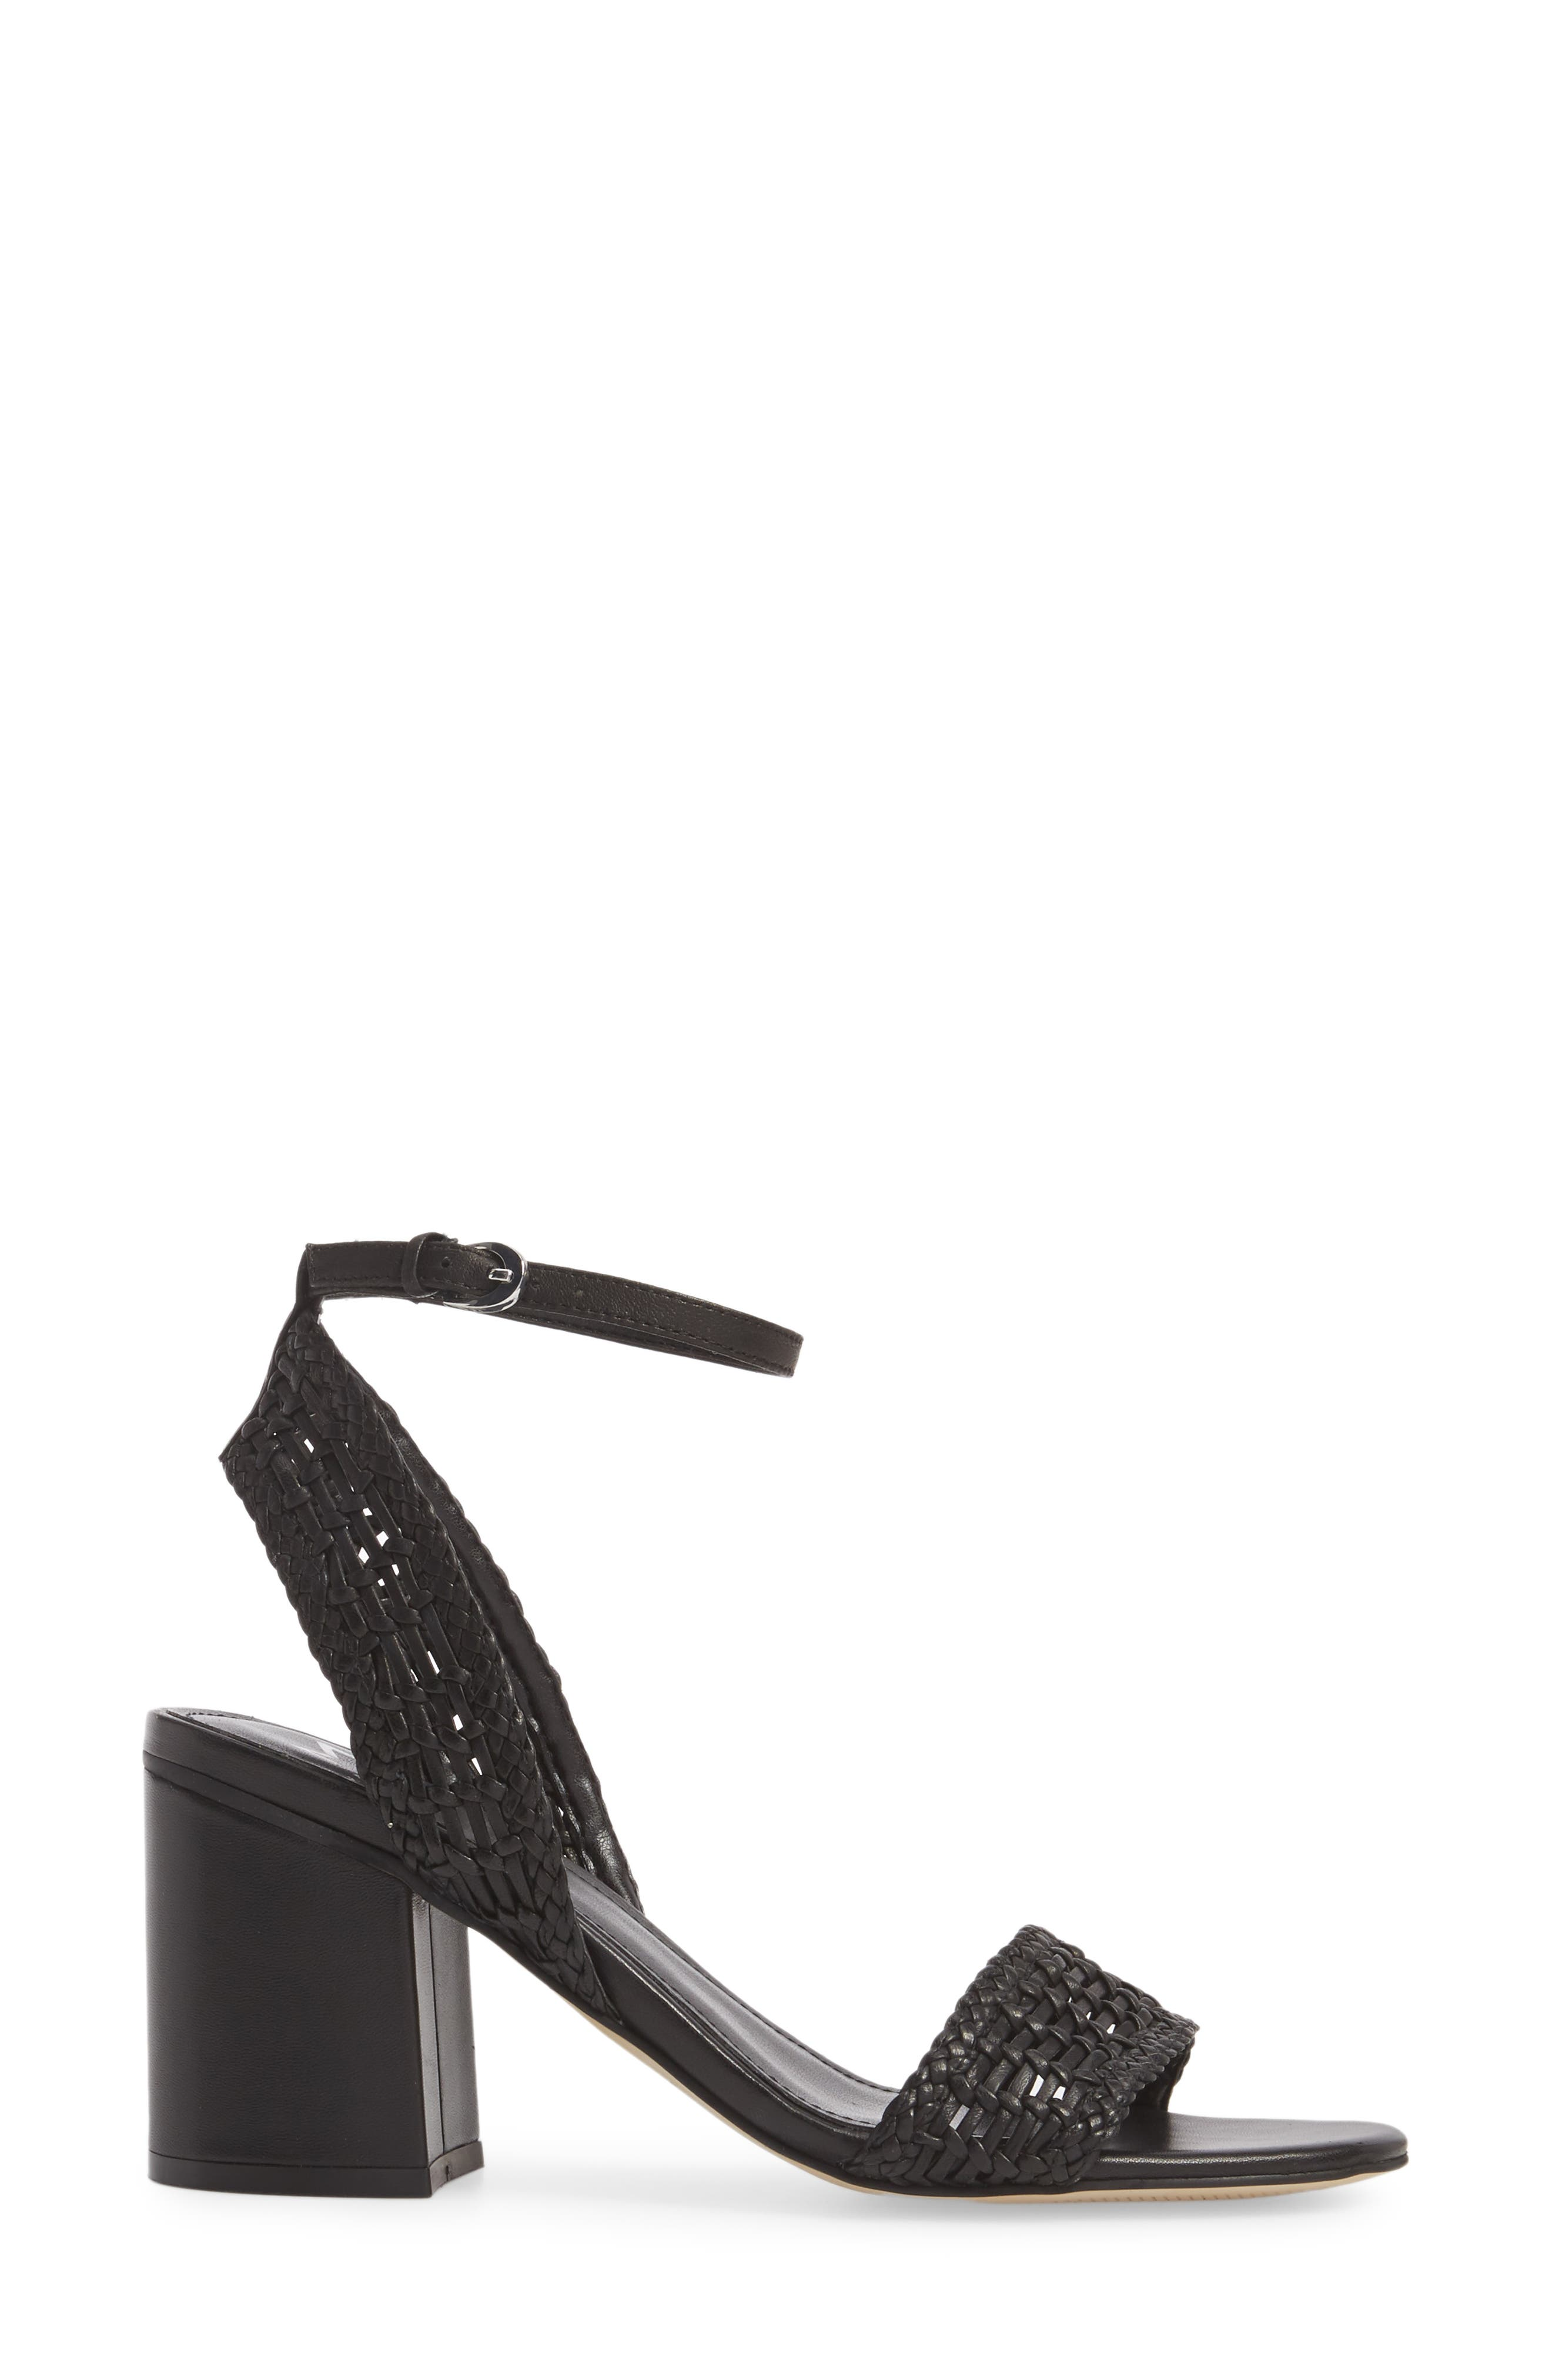 Amere Ankle Strap Sandal,                             Alternate thumbnail 3, color,                             Black Leather